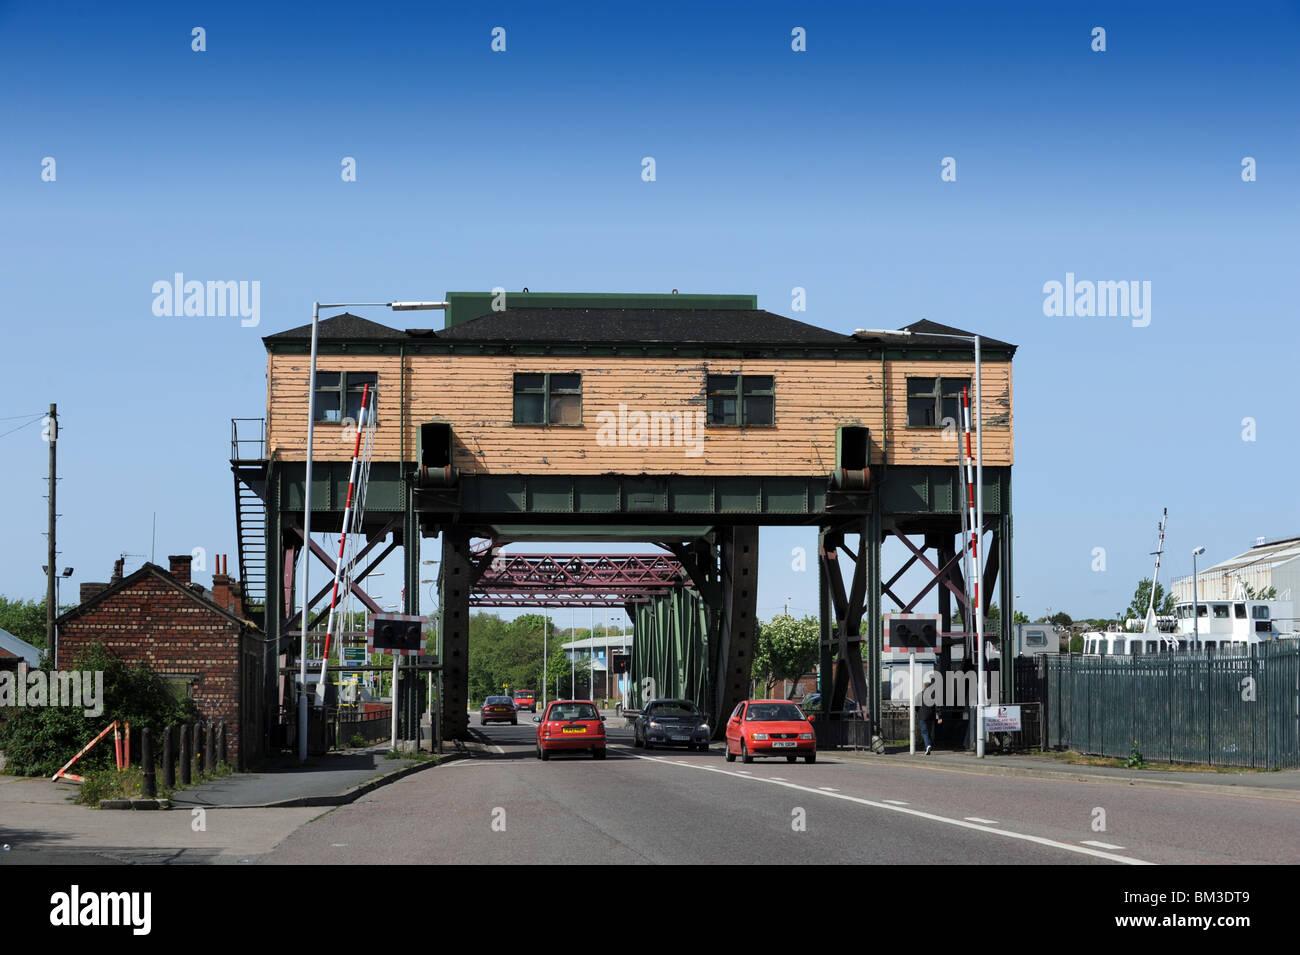 Duke Street Bridge at Birkenhead Merseyside CH41 1LG - Stock Image